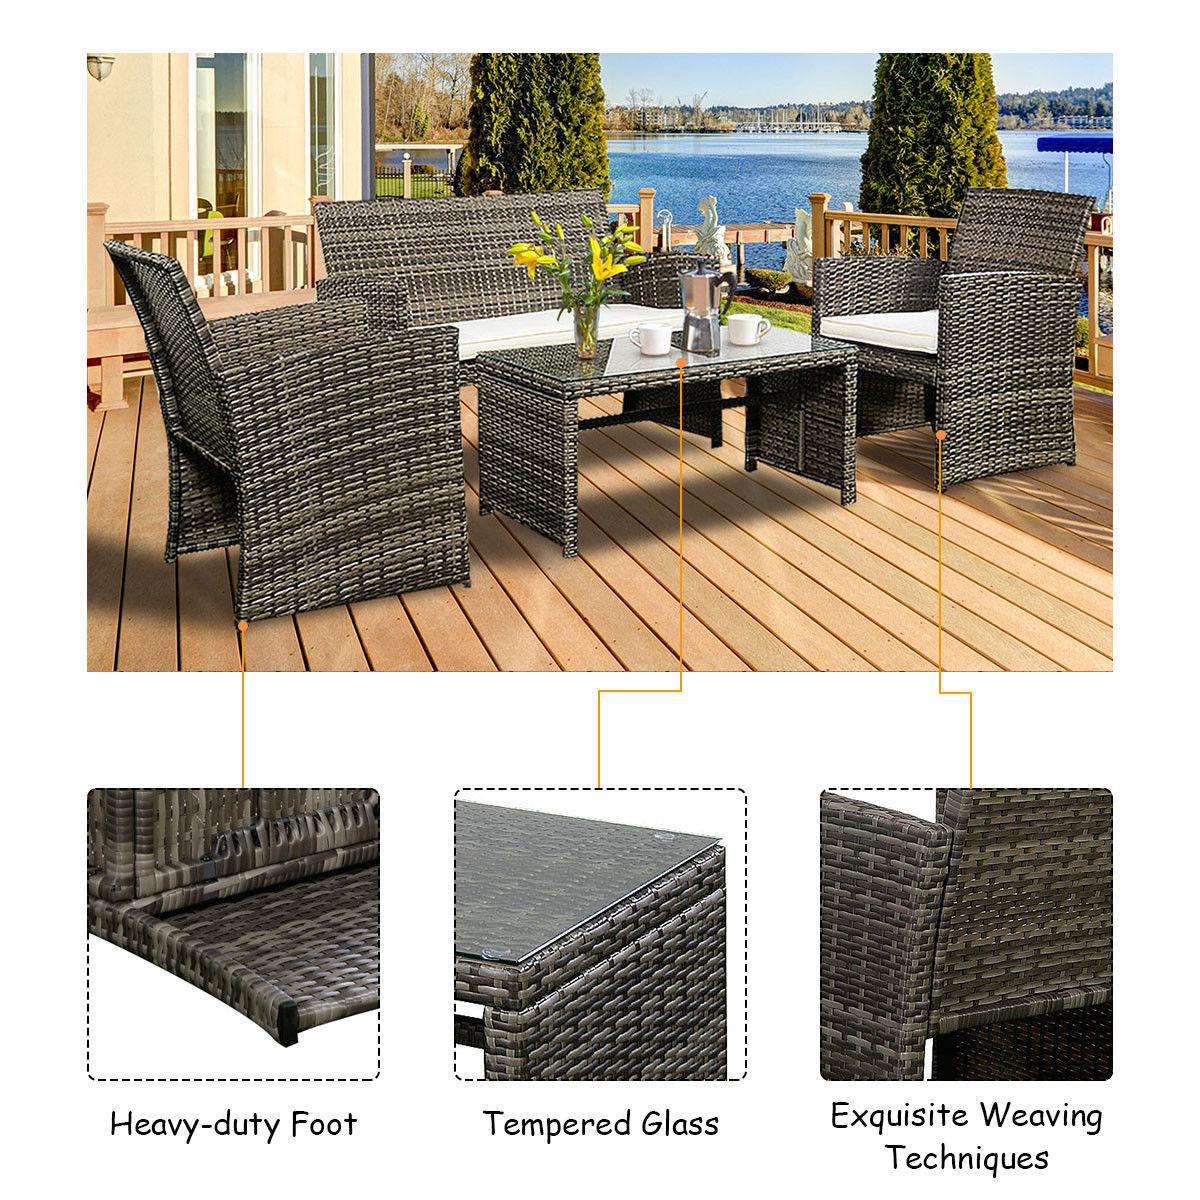 costway 4 pc rattan patio furniture set garden lawn sofa cushioned seat mix gray wicker 4 - Garden Funiture Set